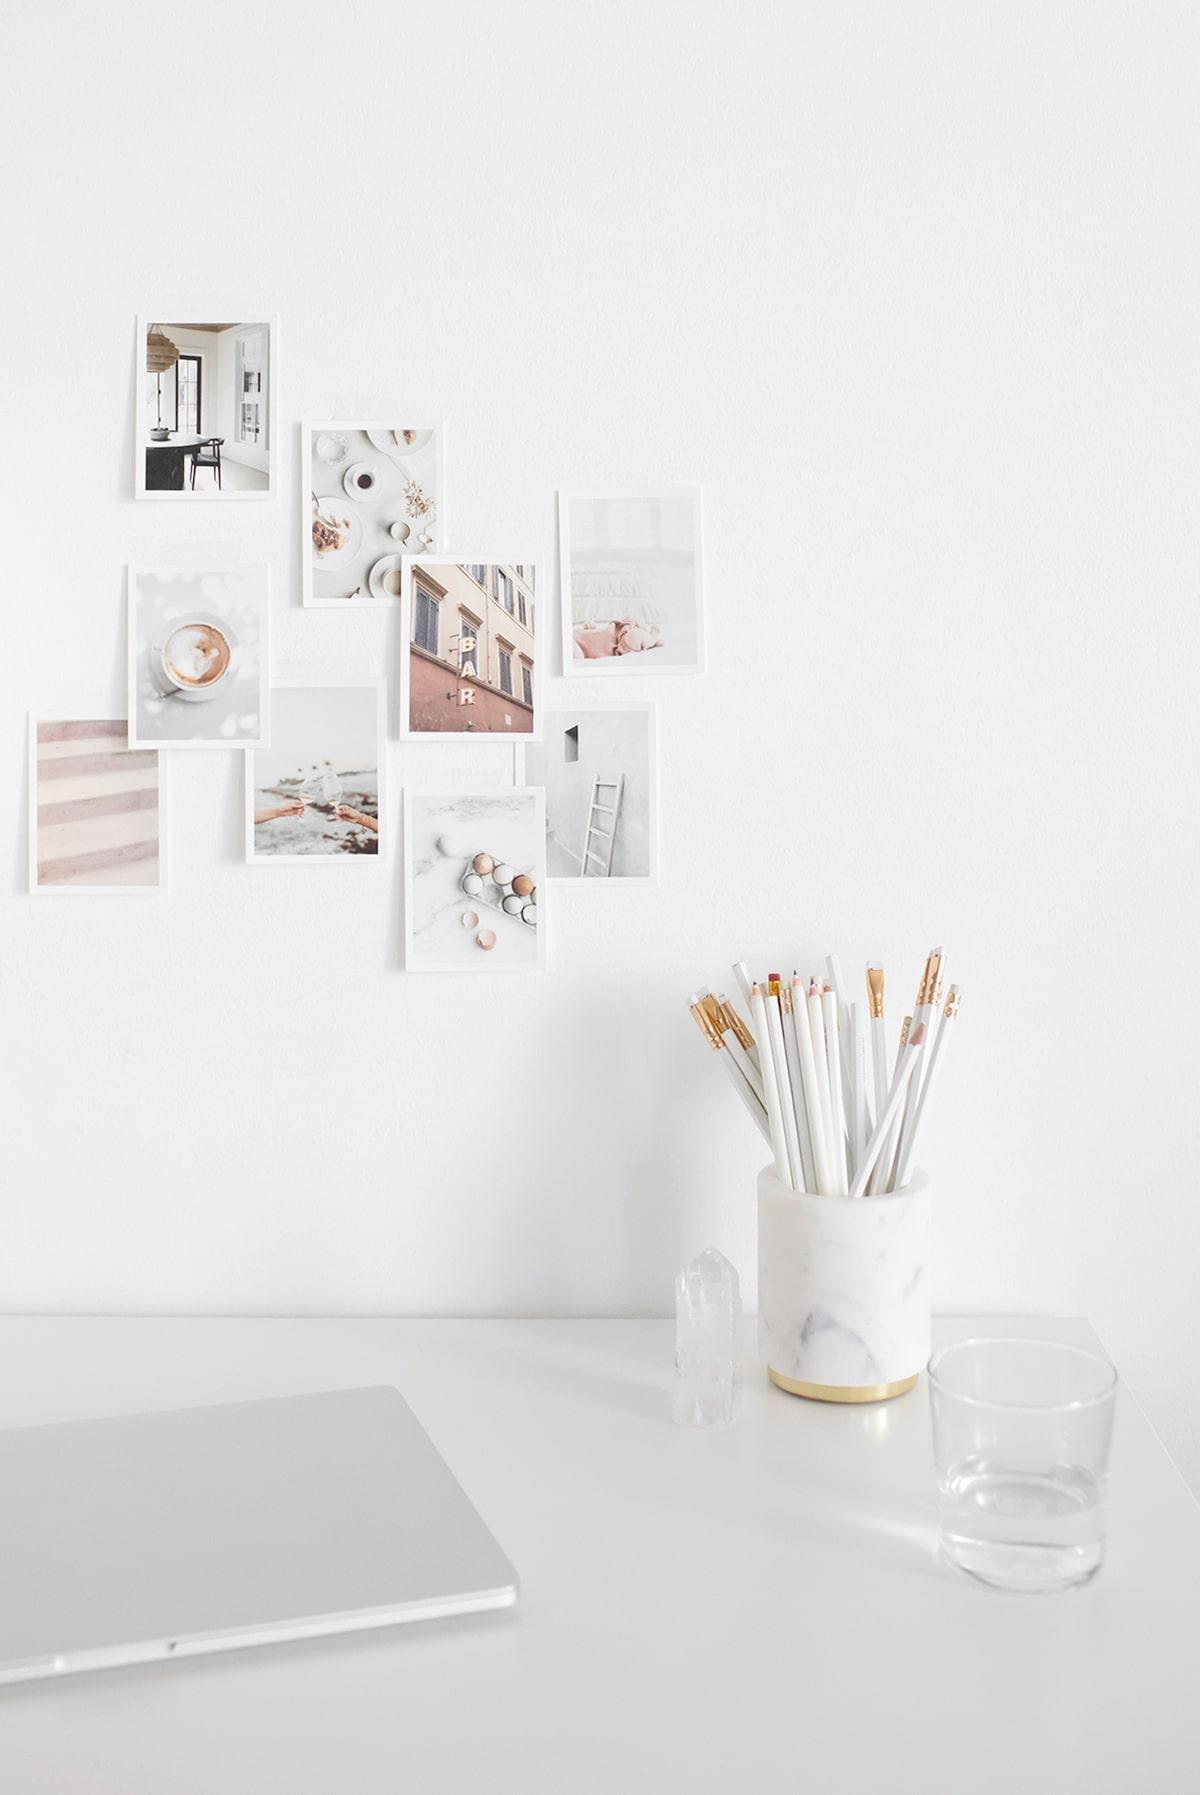 Pollyanna Consulting | Laptop and polaroids